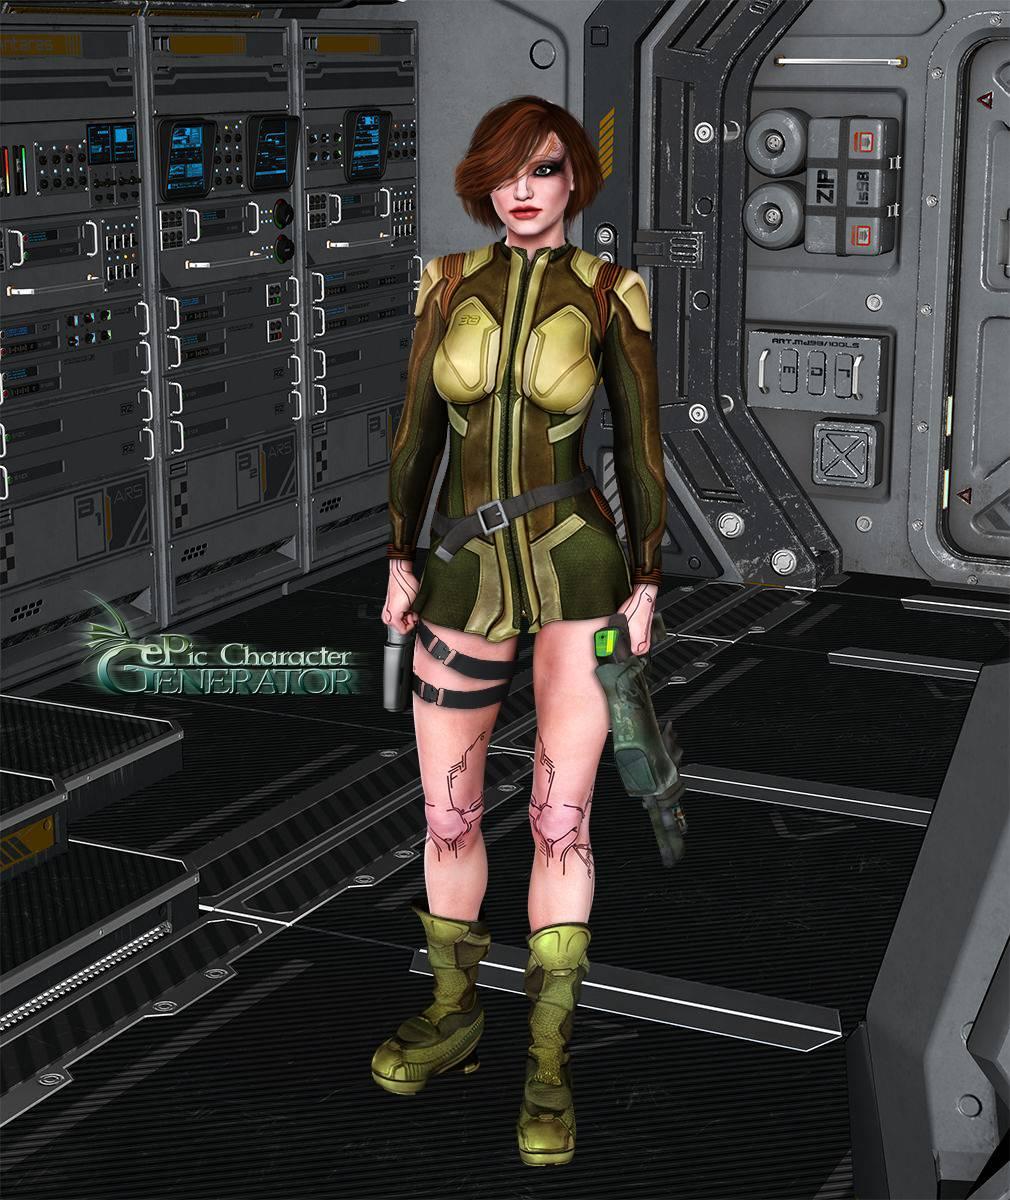 ePic Character Generator Season 2 Female Sci Fi Screenshot 10